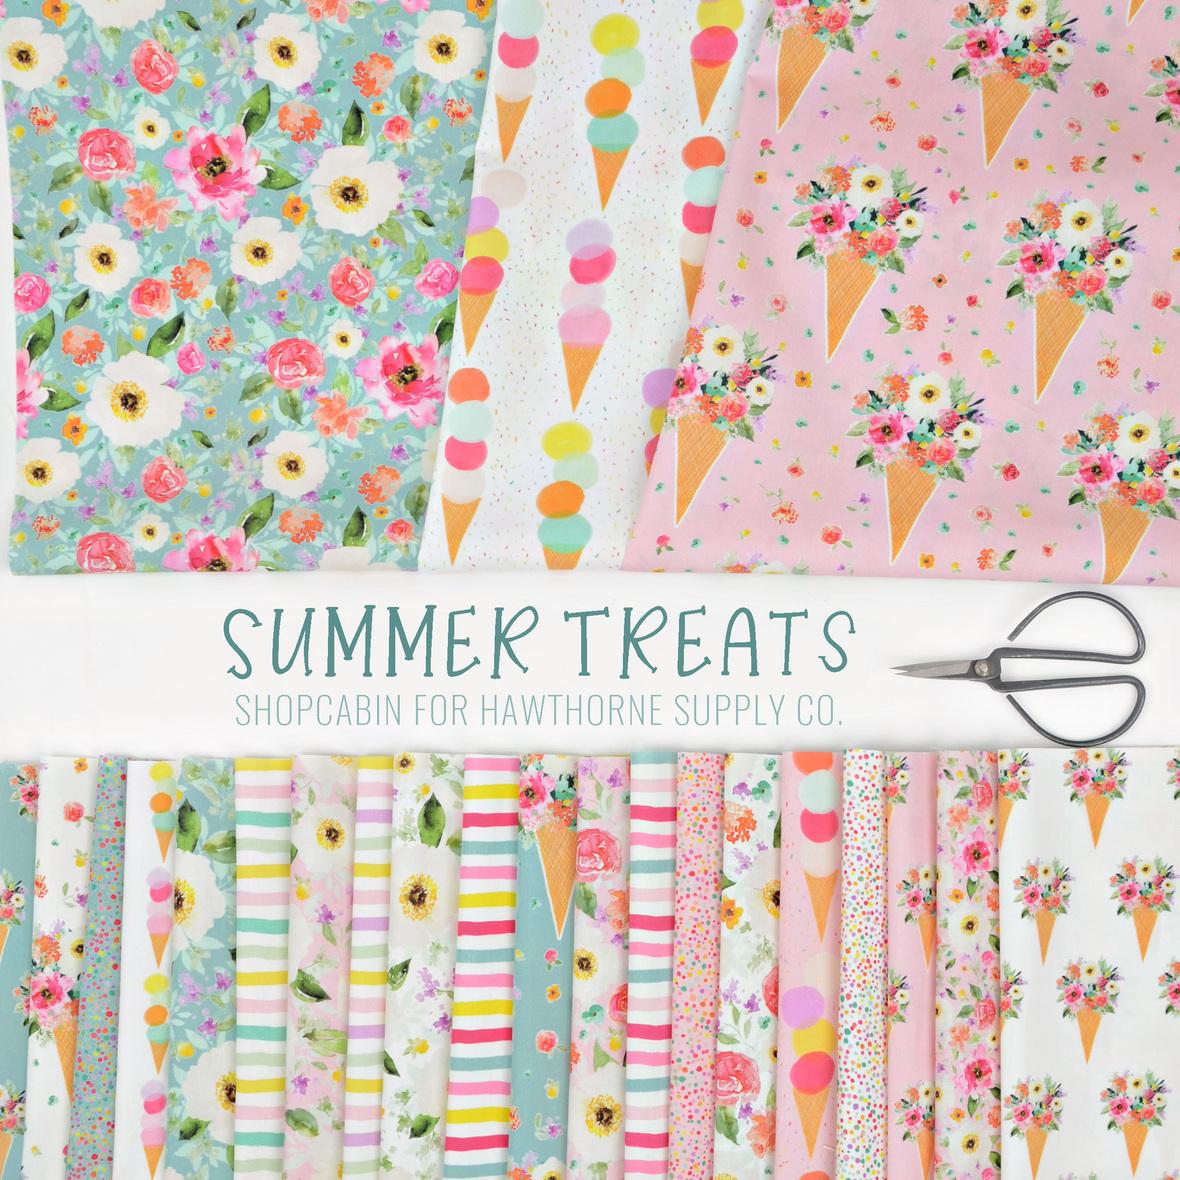 Summer Treats fabric Shopcabin for Hawthorne Supply Co